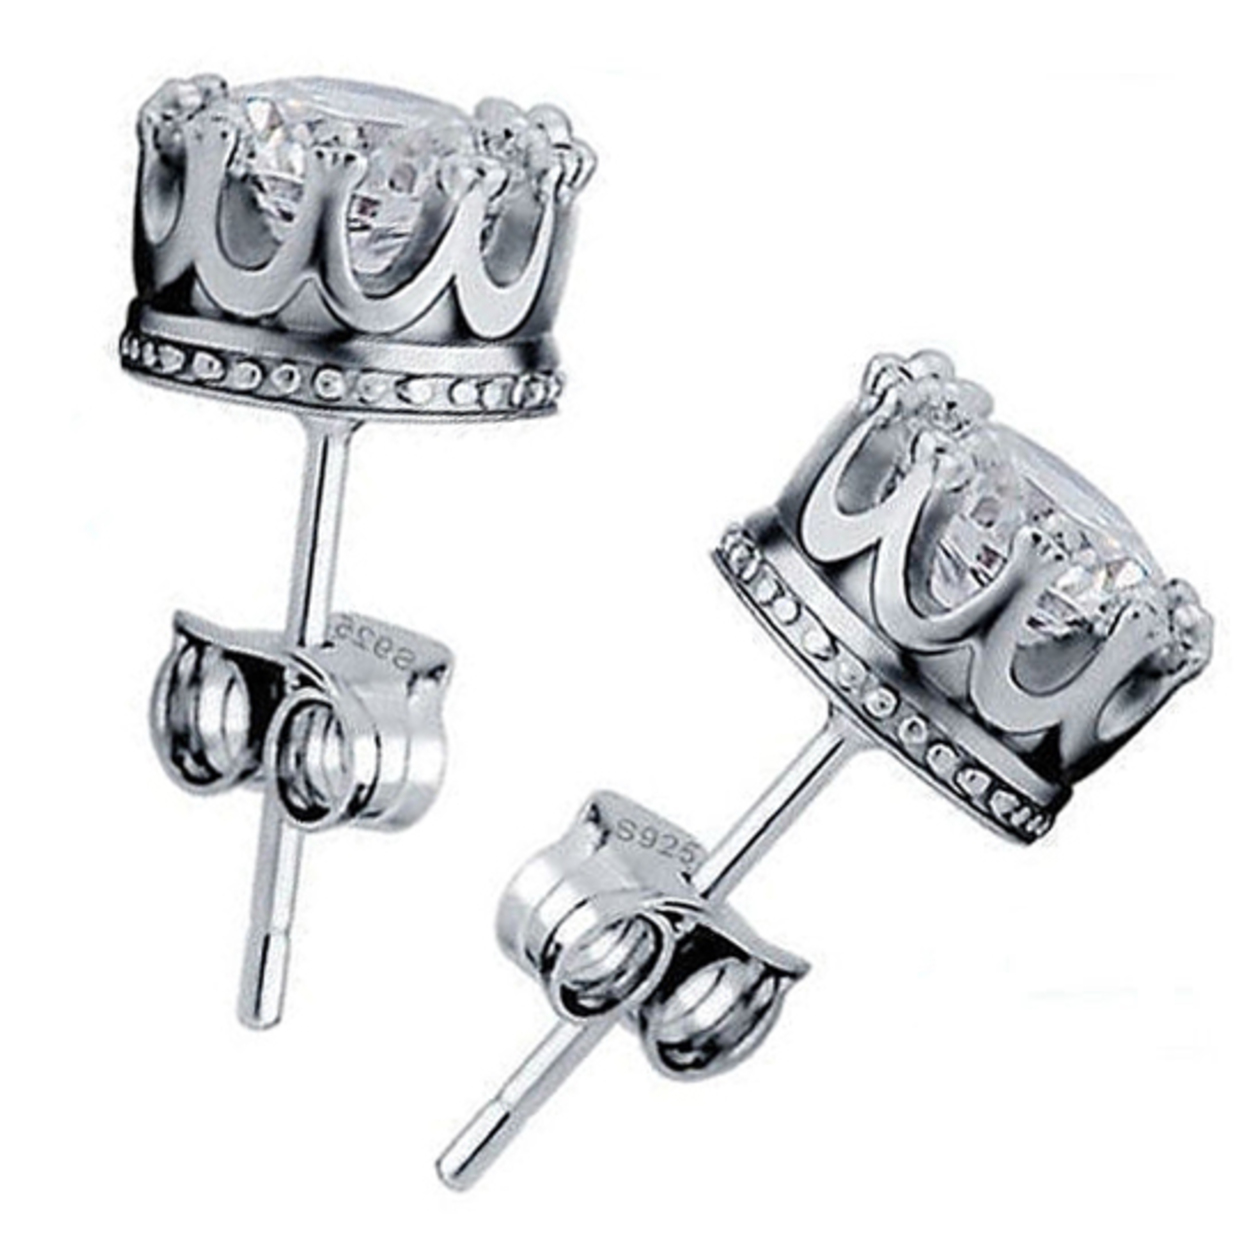 Sterling Silver Royal Crown Stud Earrings 53c96e4272989a8348000127